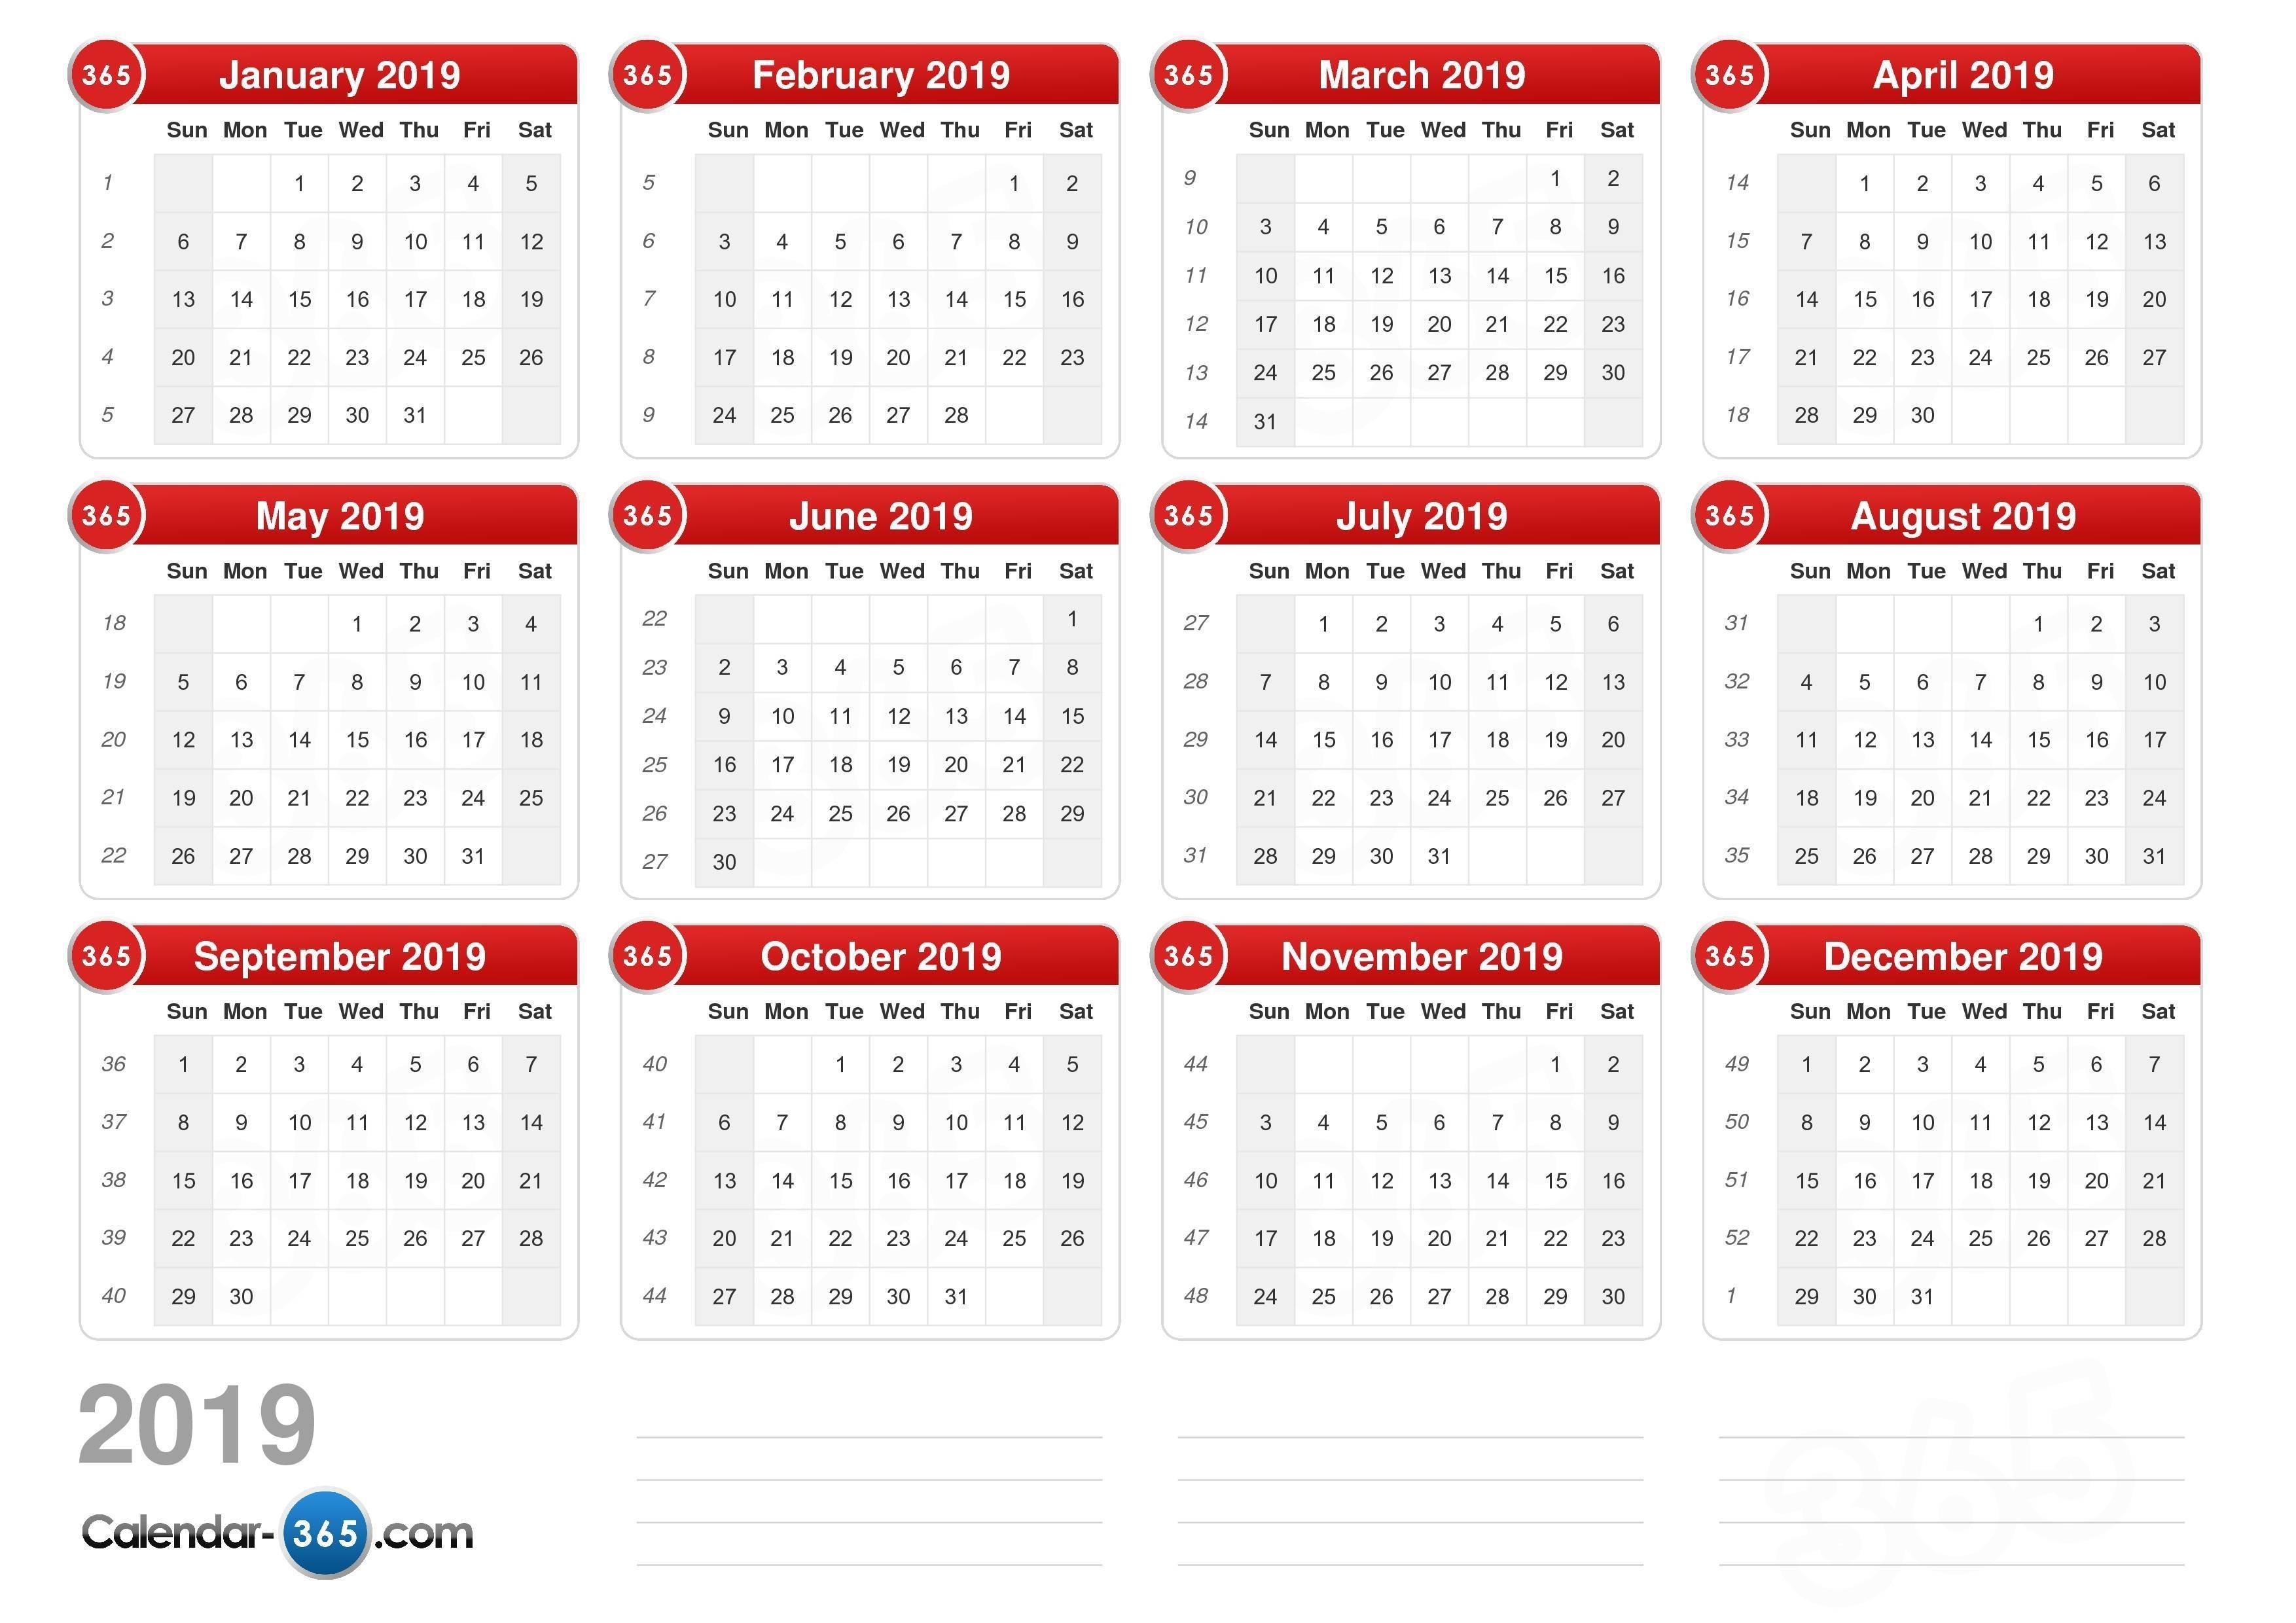 2019 Calendar Calendar 1/2019